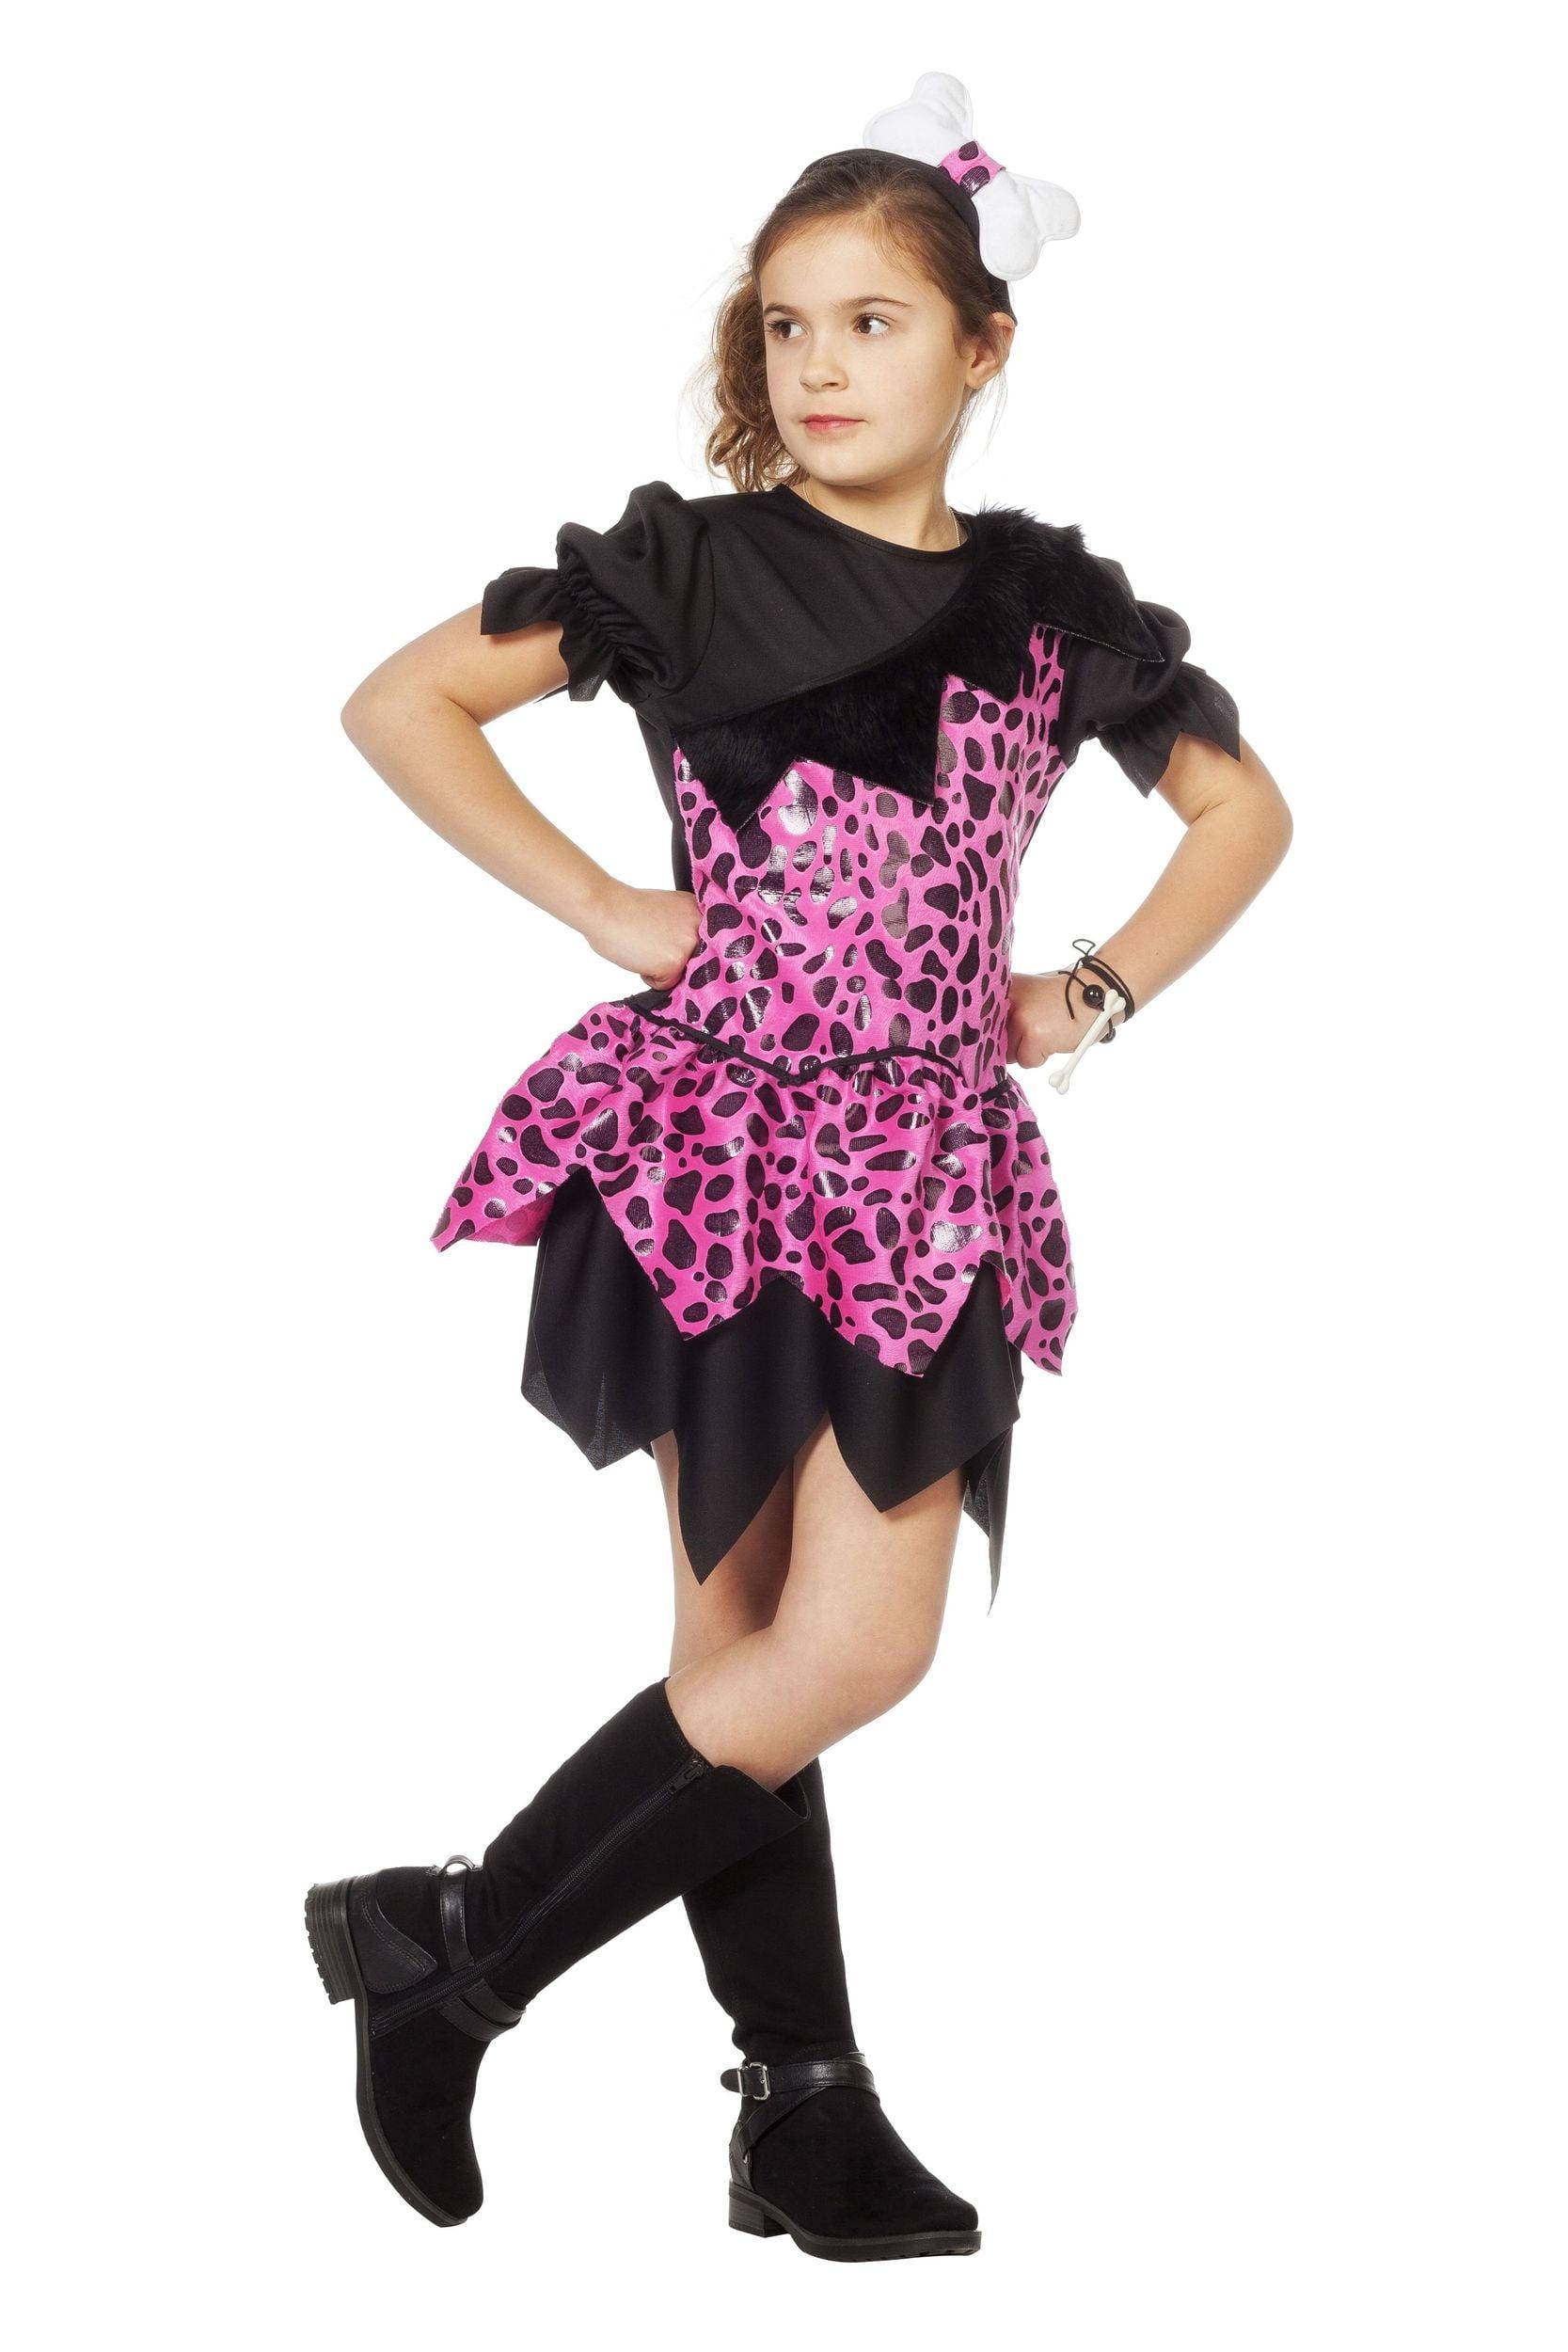 Cave Girl, jurk en hoofband